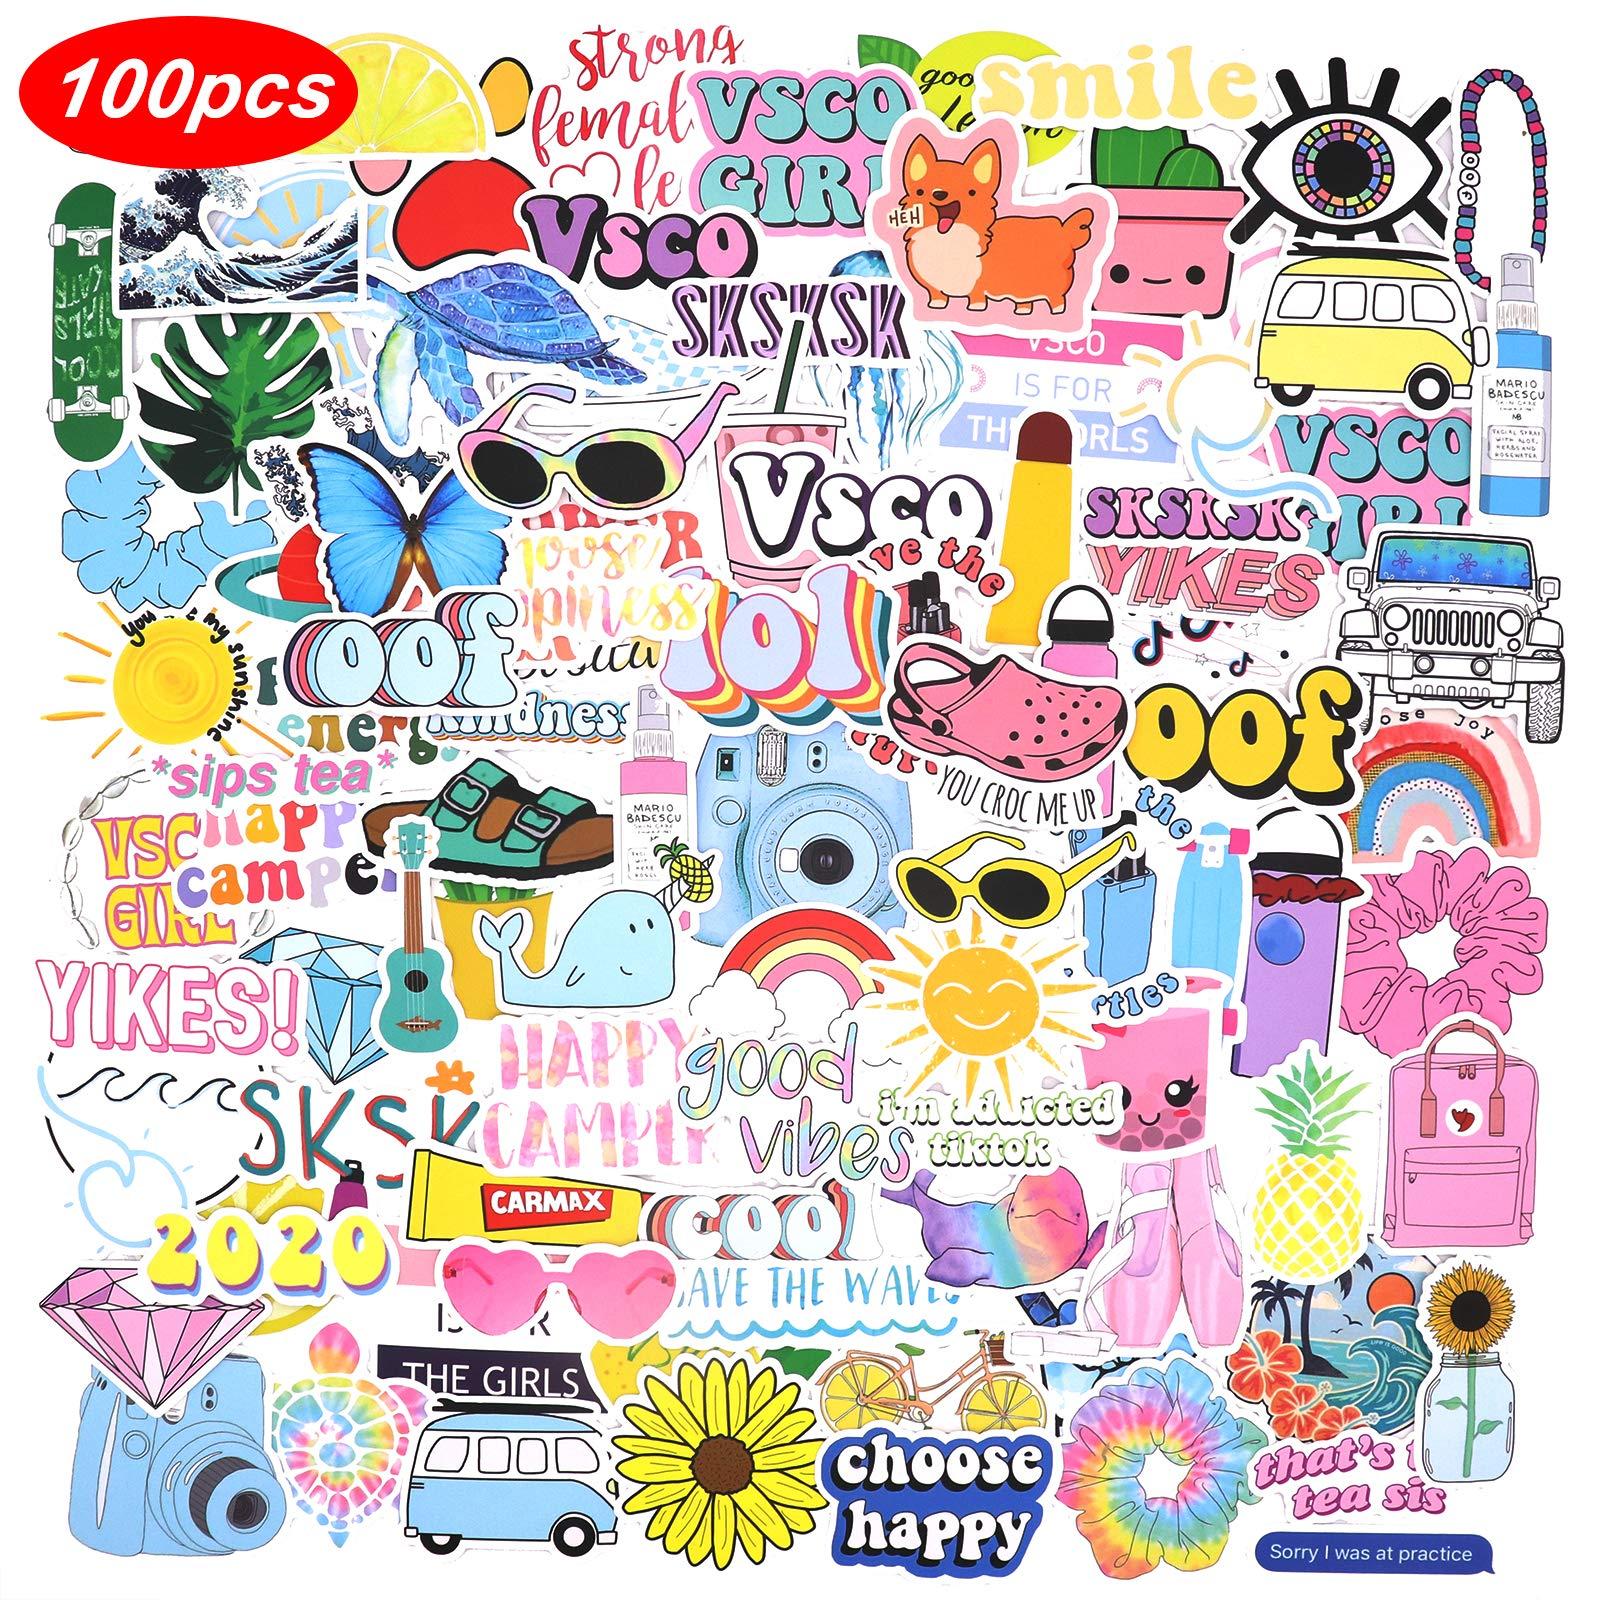 100 Pink Vsco Stickers Aesthetic Stickers Cute Stickers Laptop Stickers Vinyl Stickers Stickers For Water Bottles Waterproof Stickers For Kids Teen Girls Sticker Packs Amazon Sg Electronics